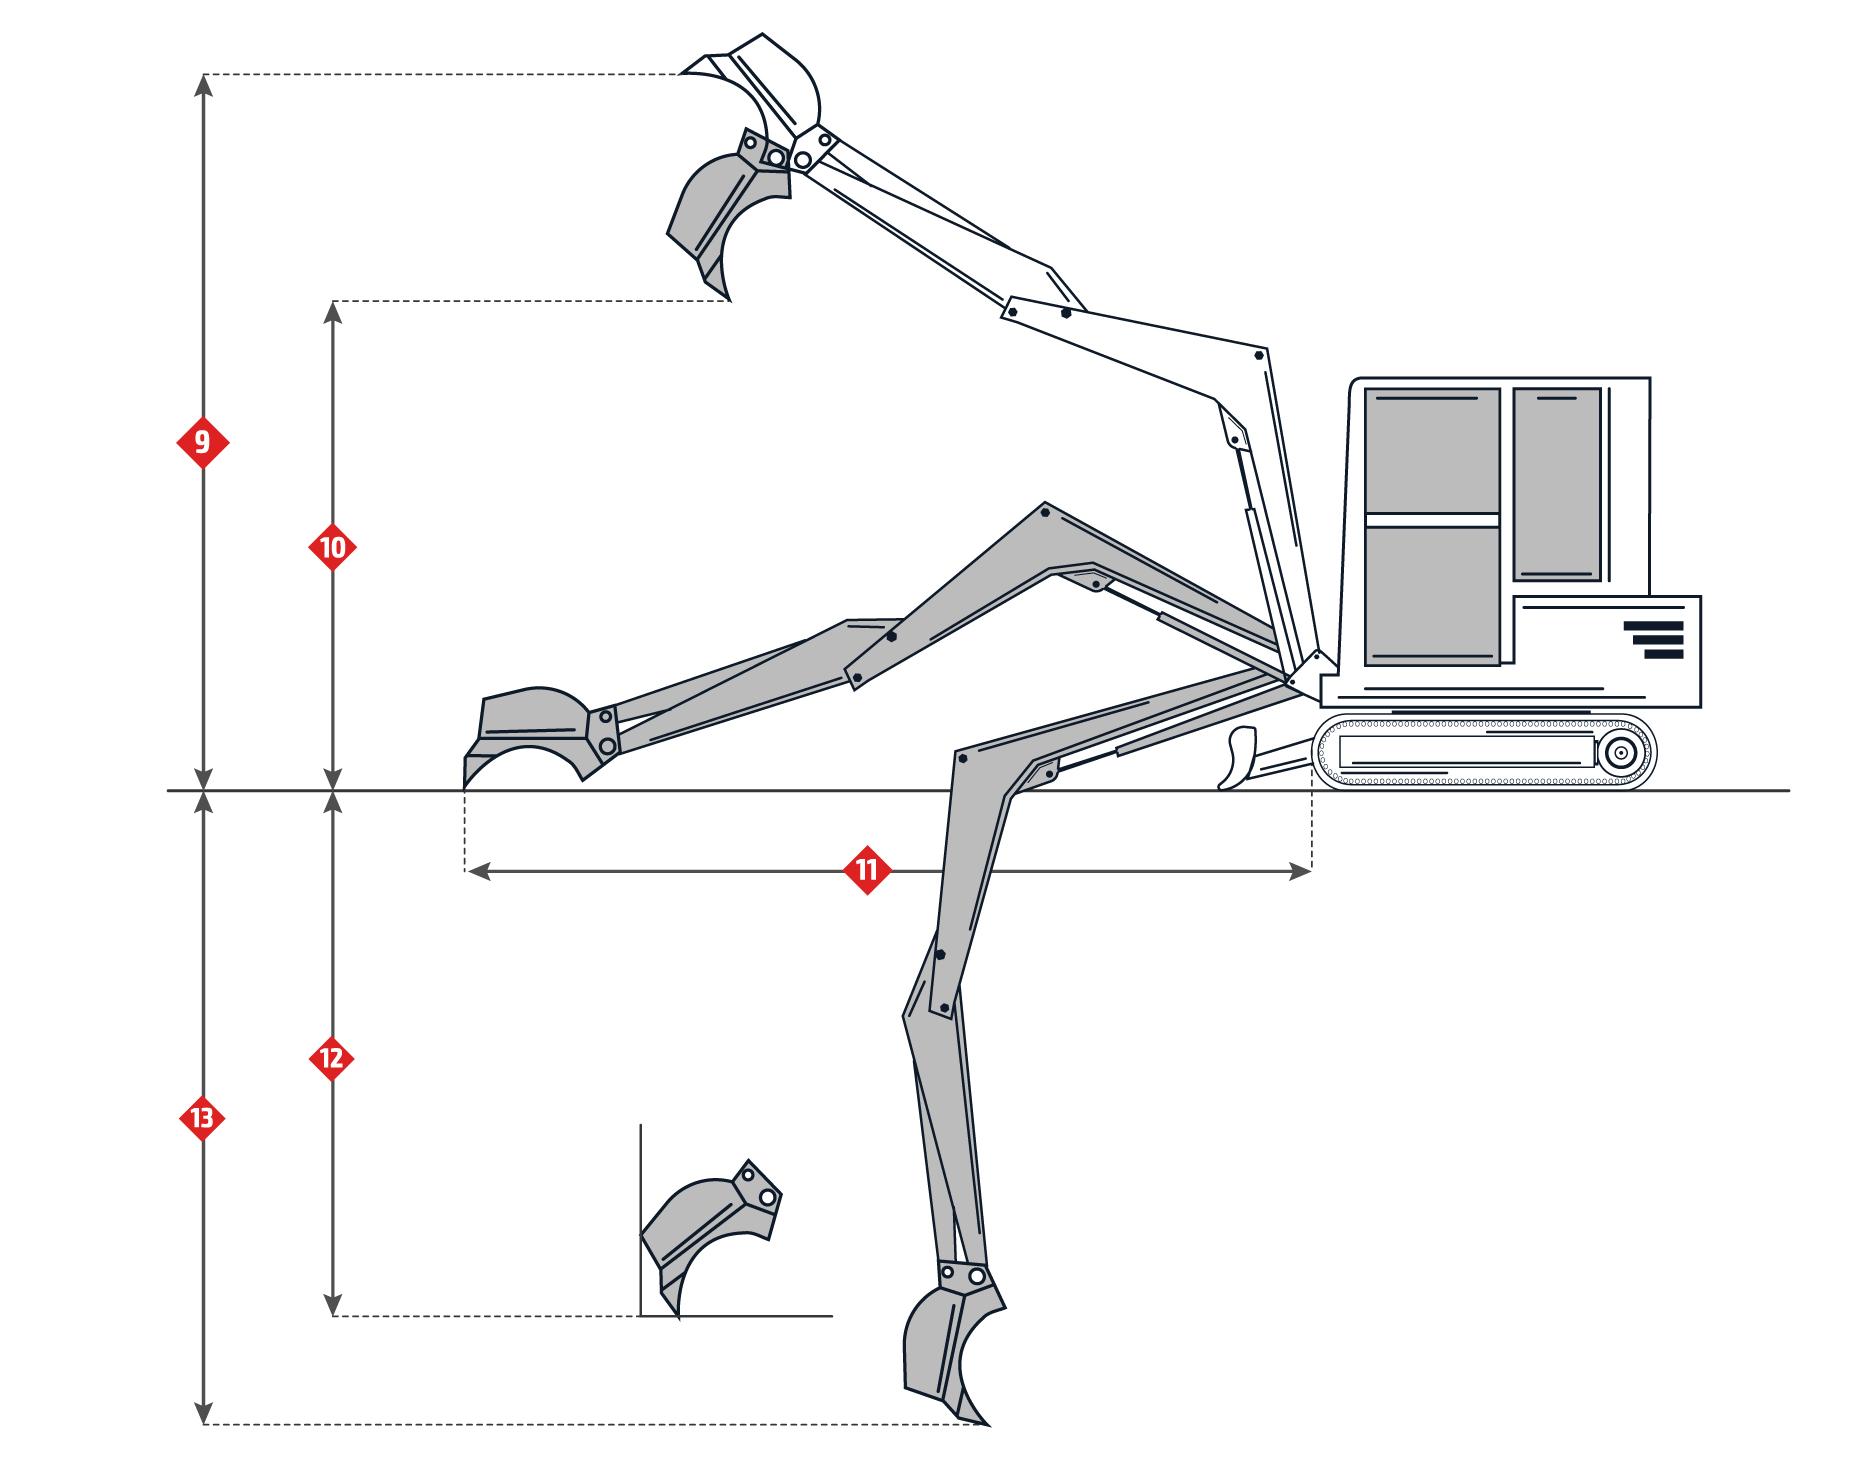 Komatsu PC50MR-2 Specifications. Medium-Sized Excavator.